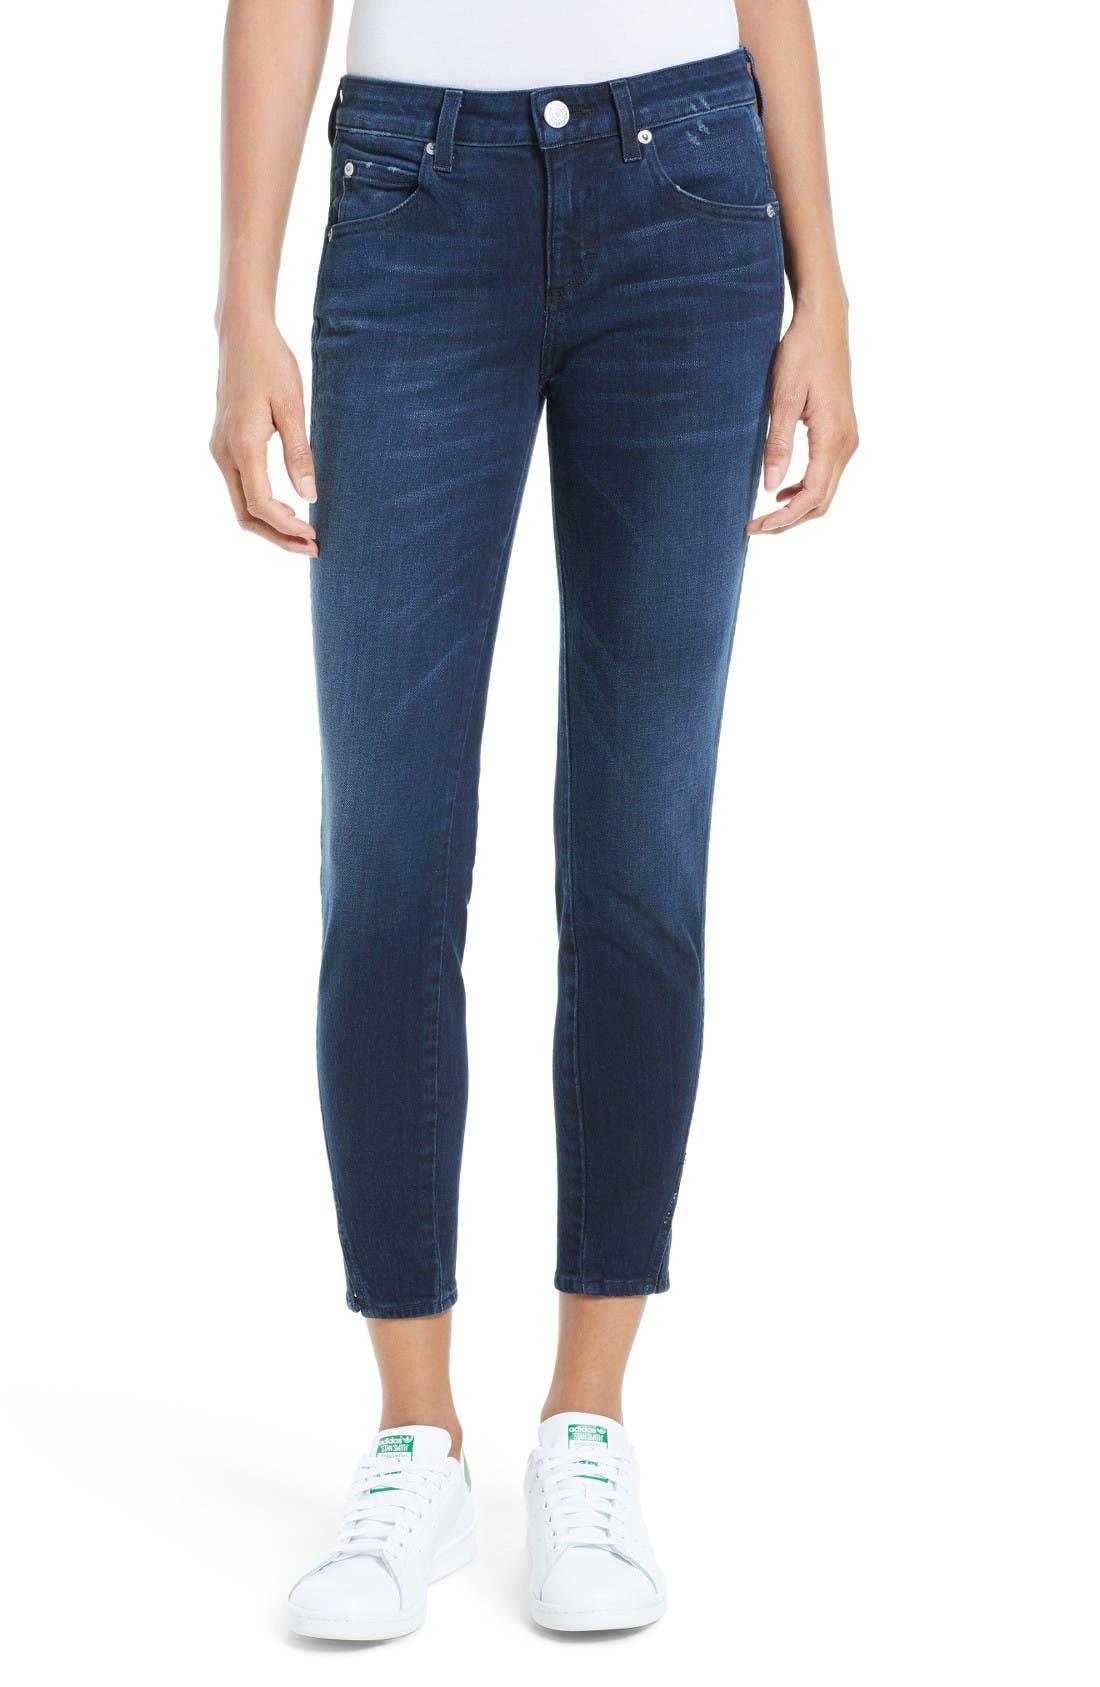 Alternate Image 1 Selected - AMO 'Twist' Crop Skinny Jeans (Eclipse)